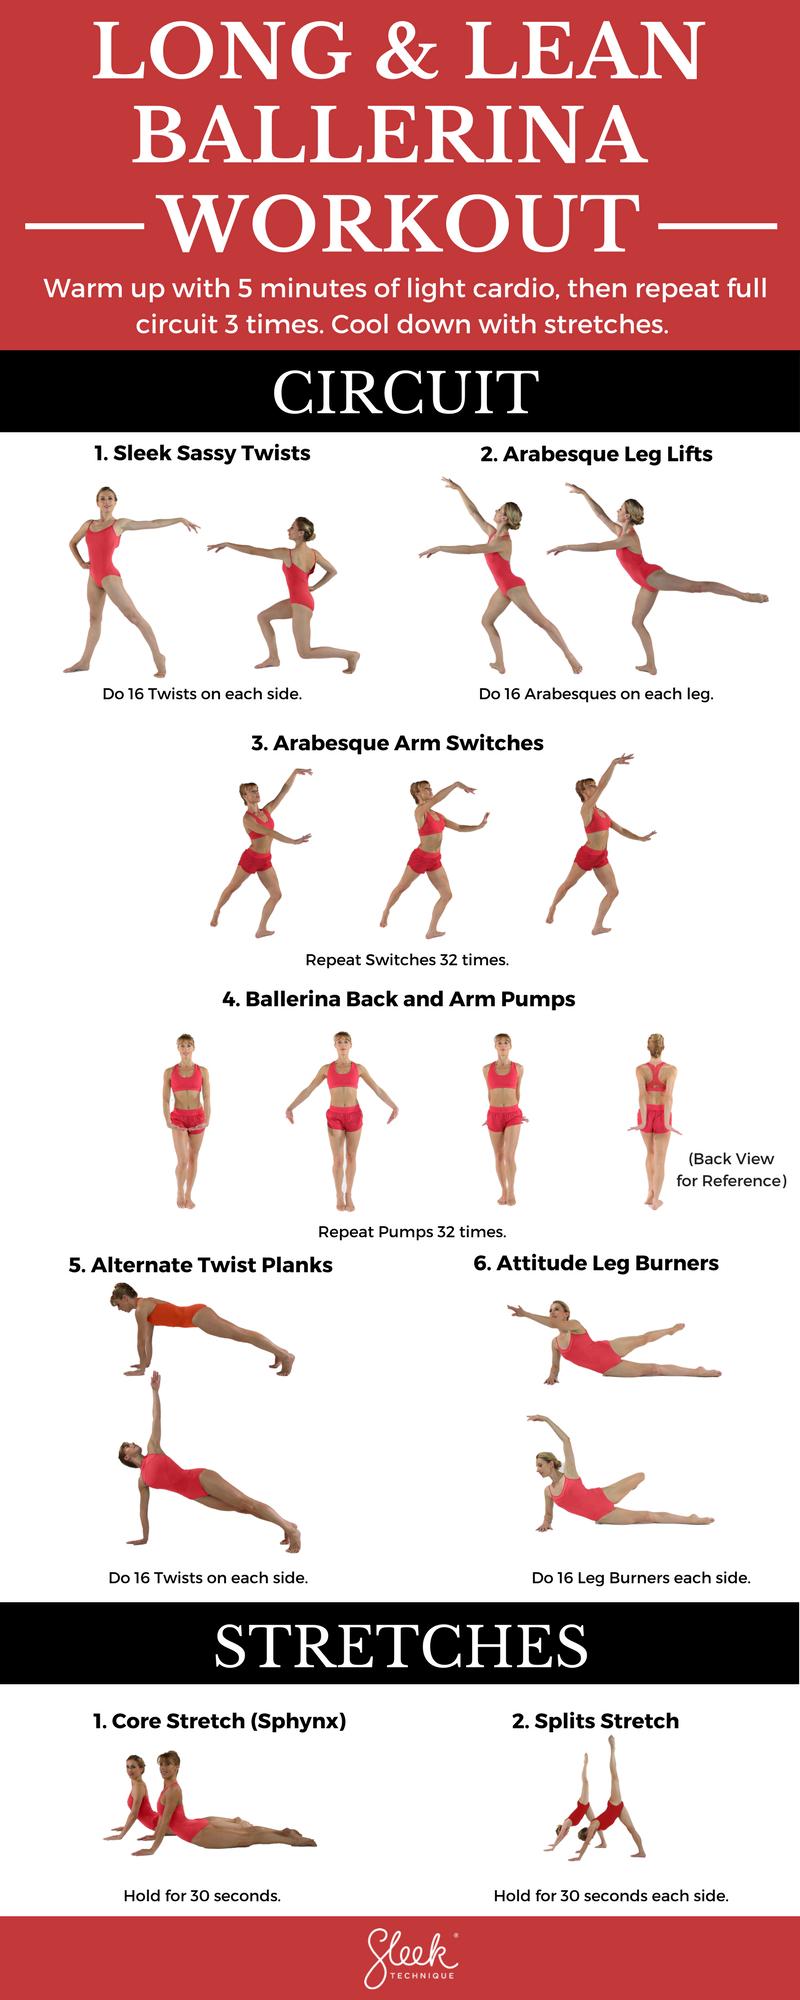 Long amp; Lean Ballerina Body Workout #infographic #ballet #workout #sleektechnique #fitness #fitmom...